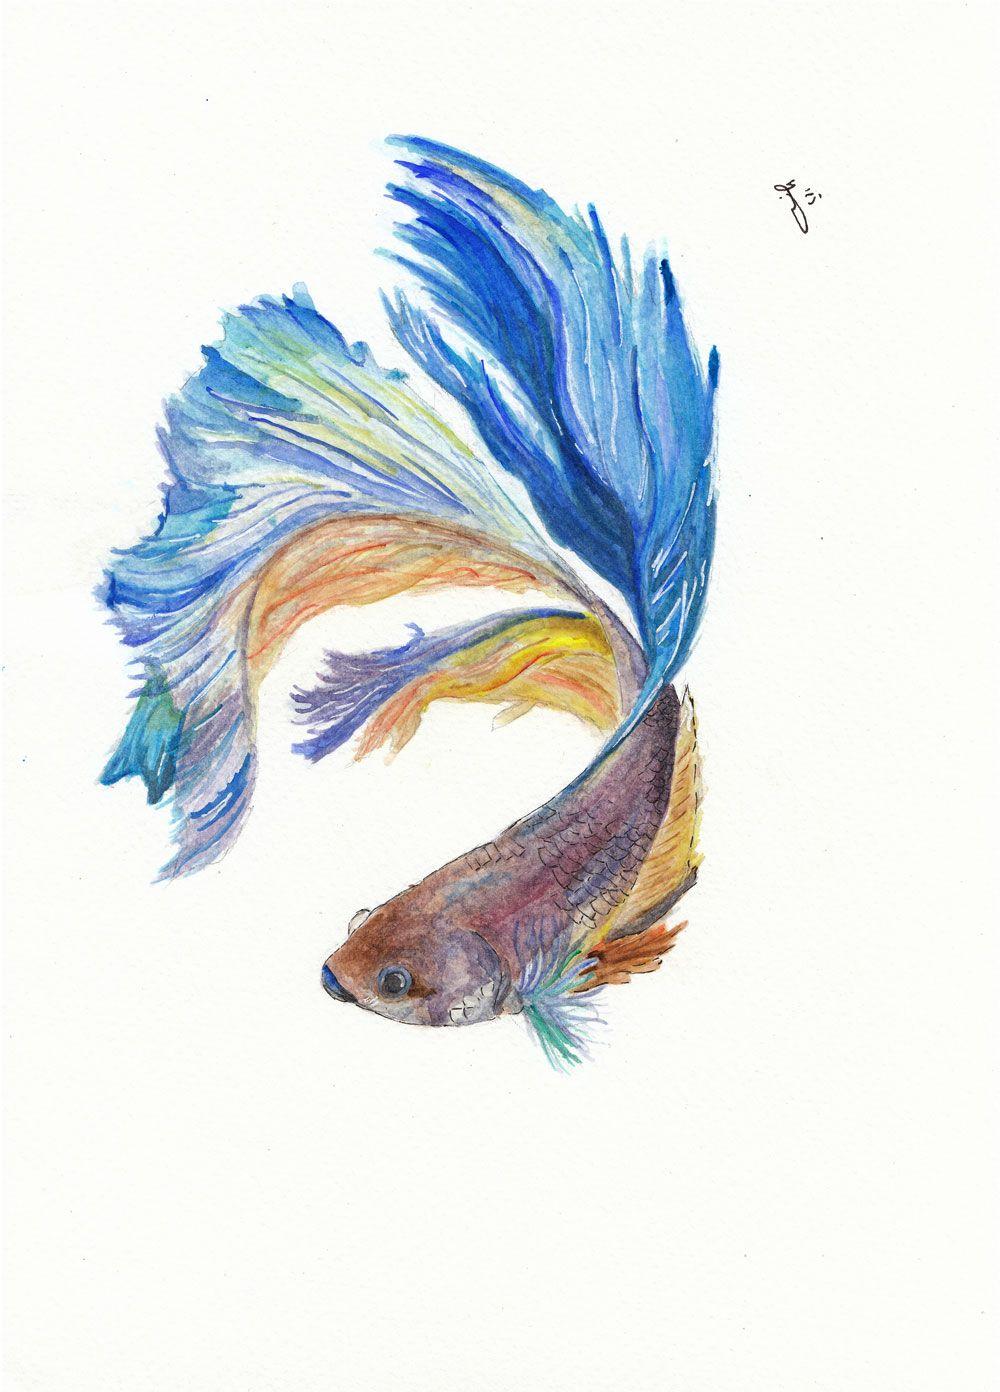 Fighting Fish Watercolor Society6 Com Inkycatstudio Fish Art Watercolor Fish Betta Fish Tattoo